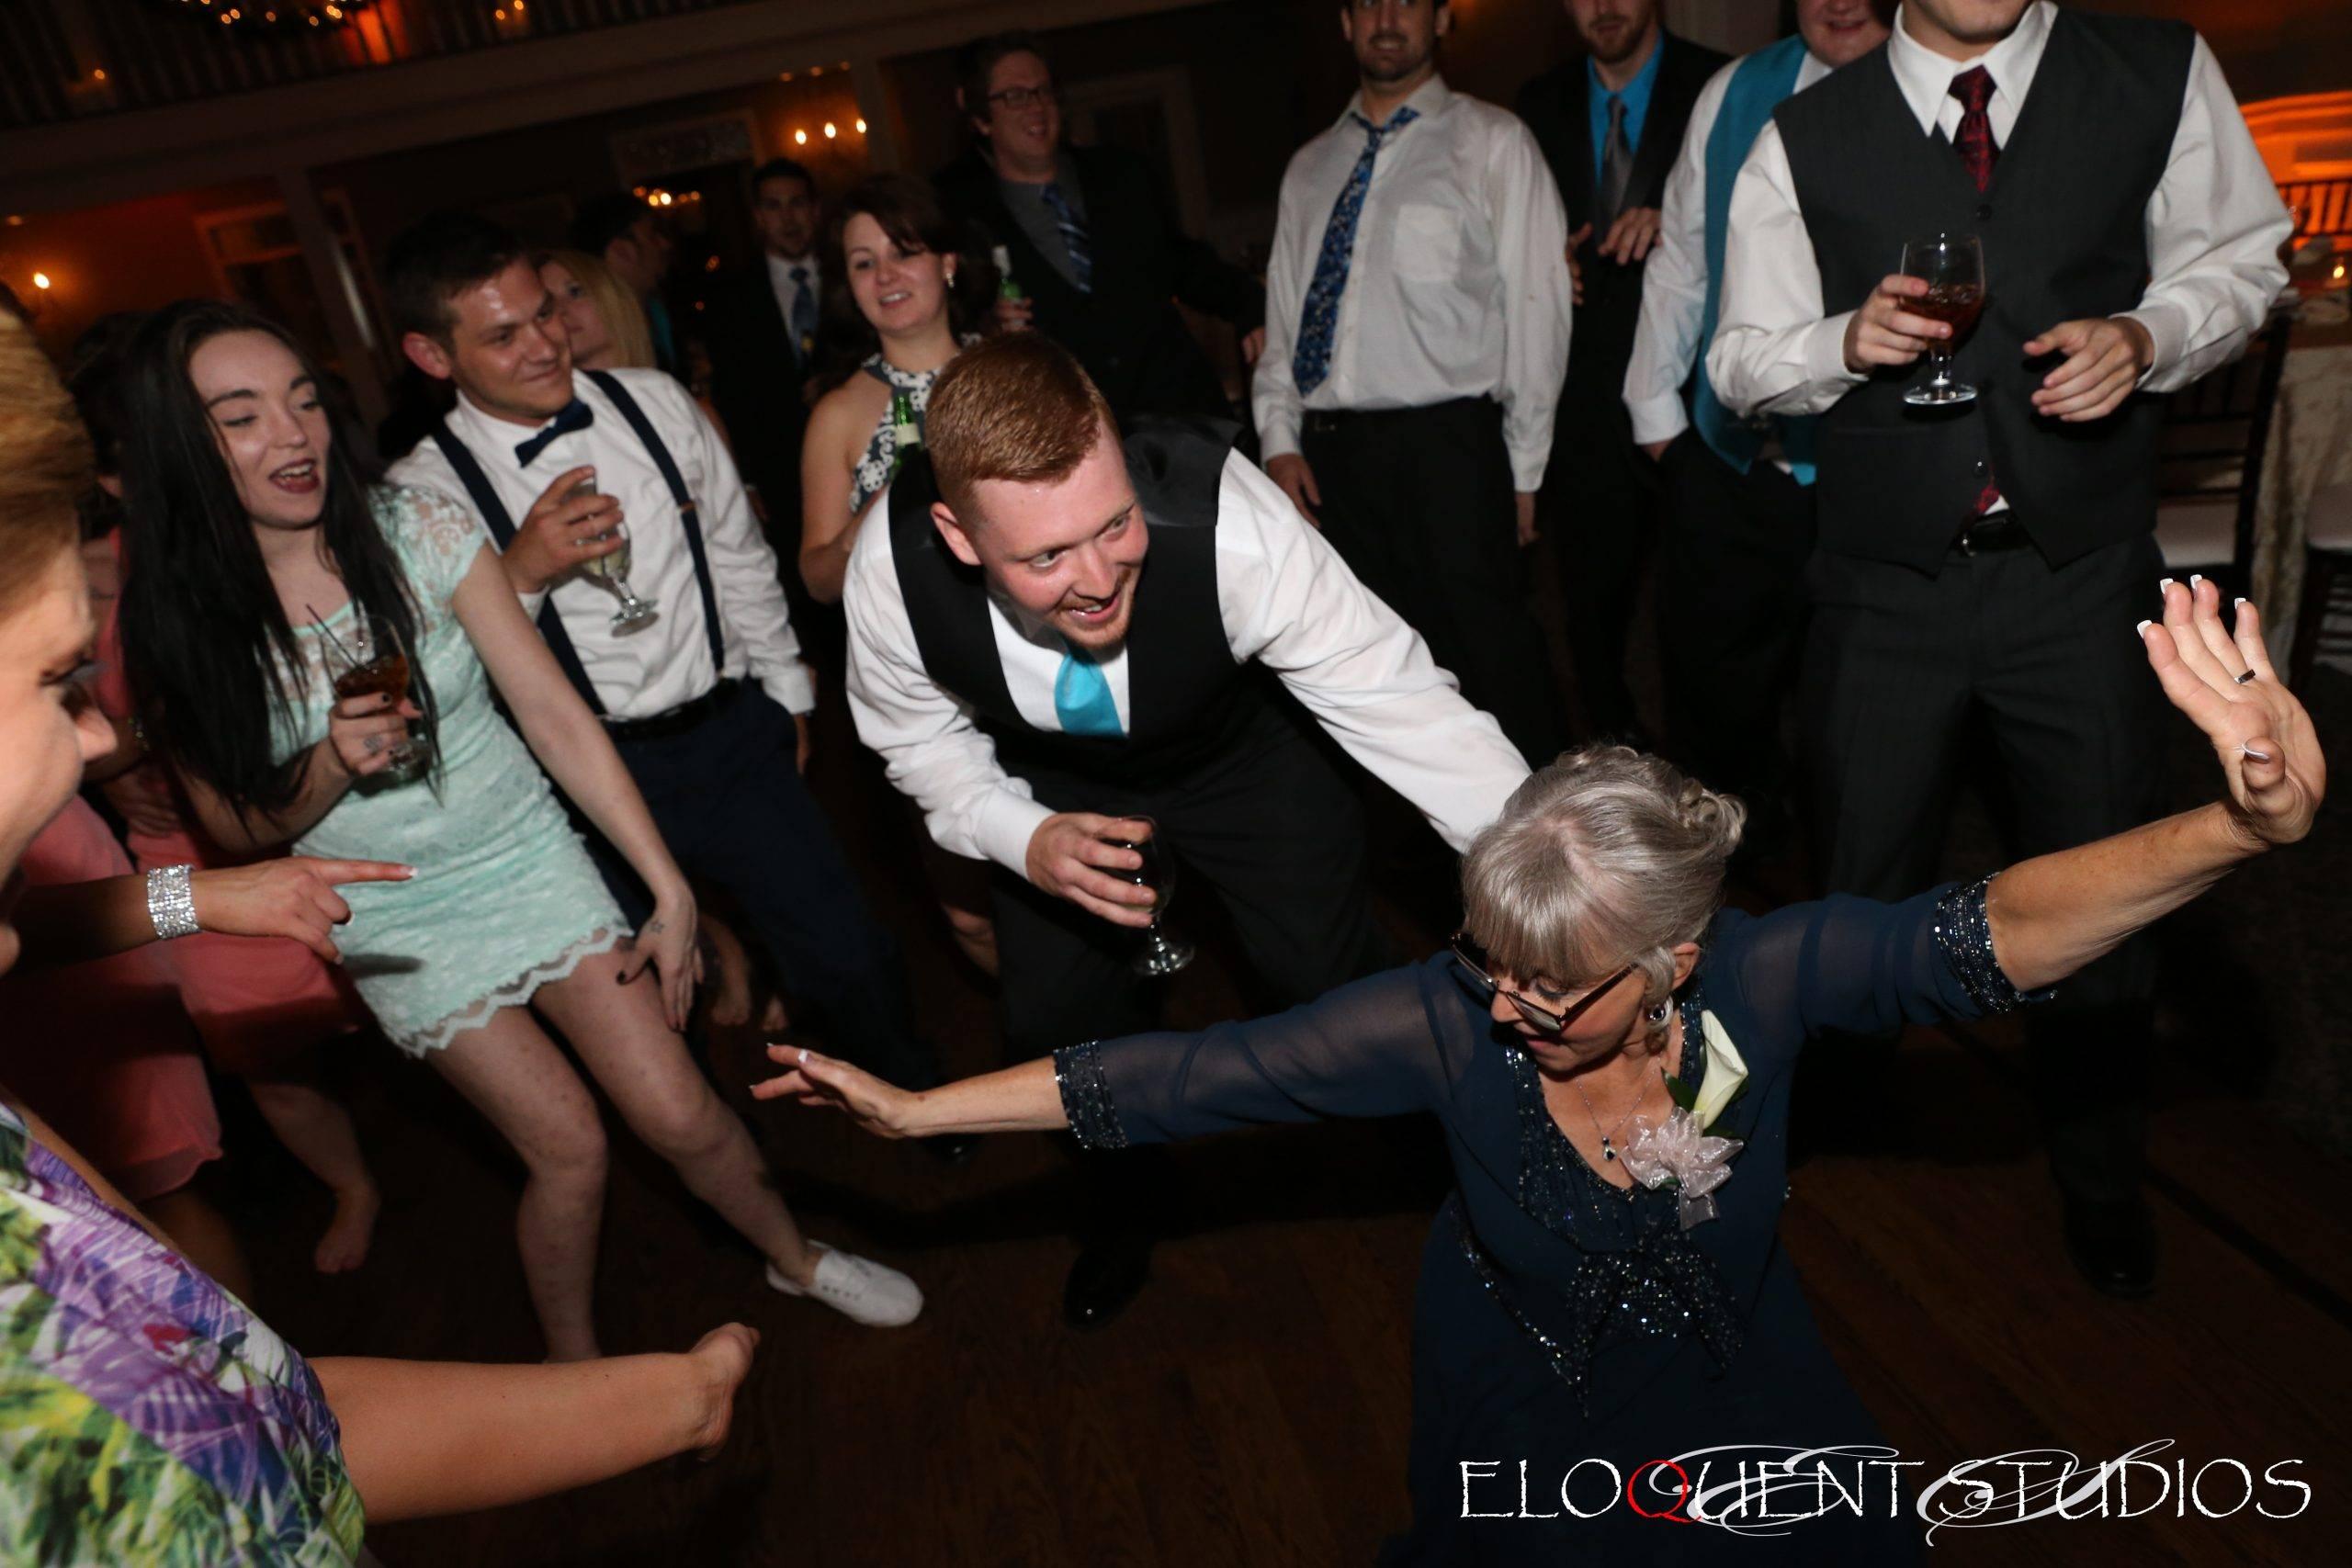 David's Country Inn dancing at the wedding